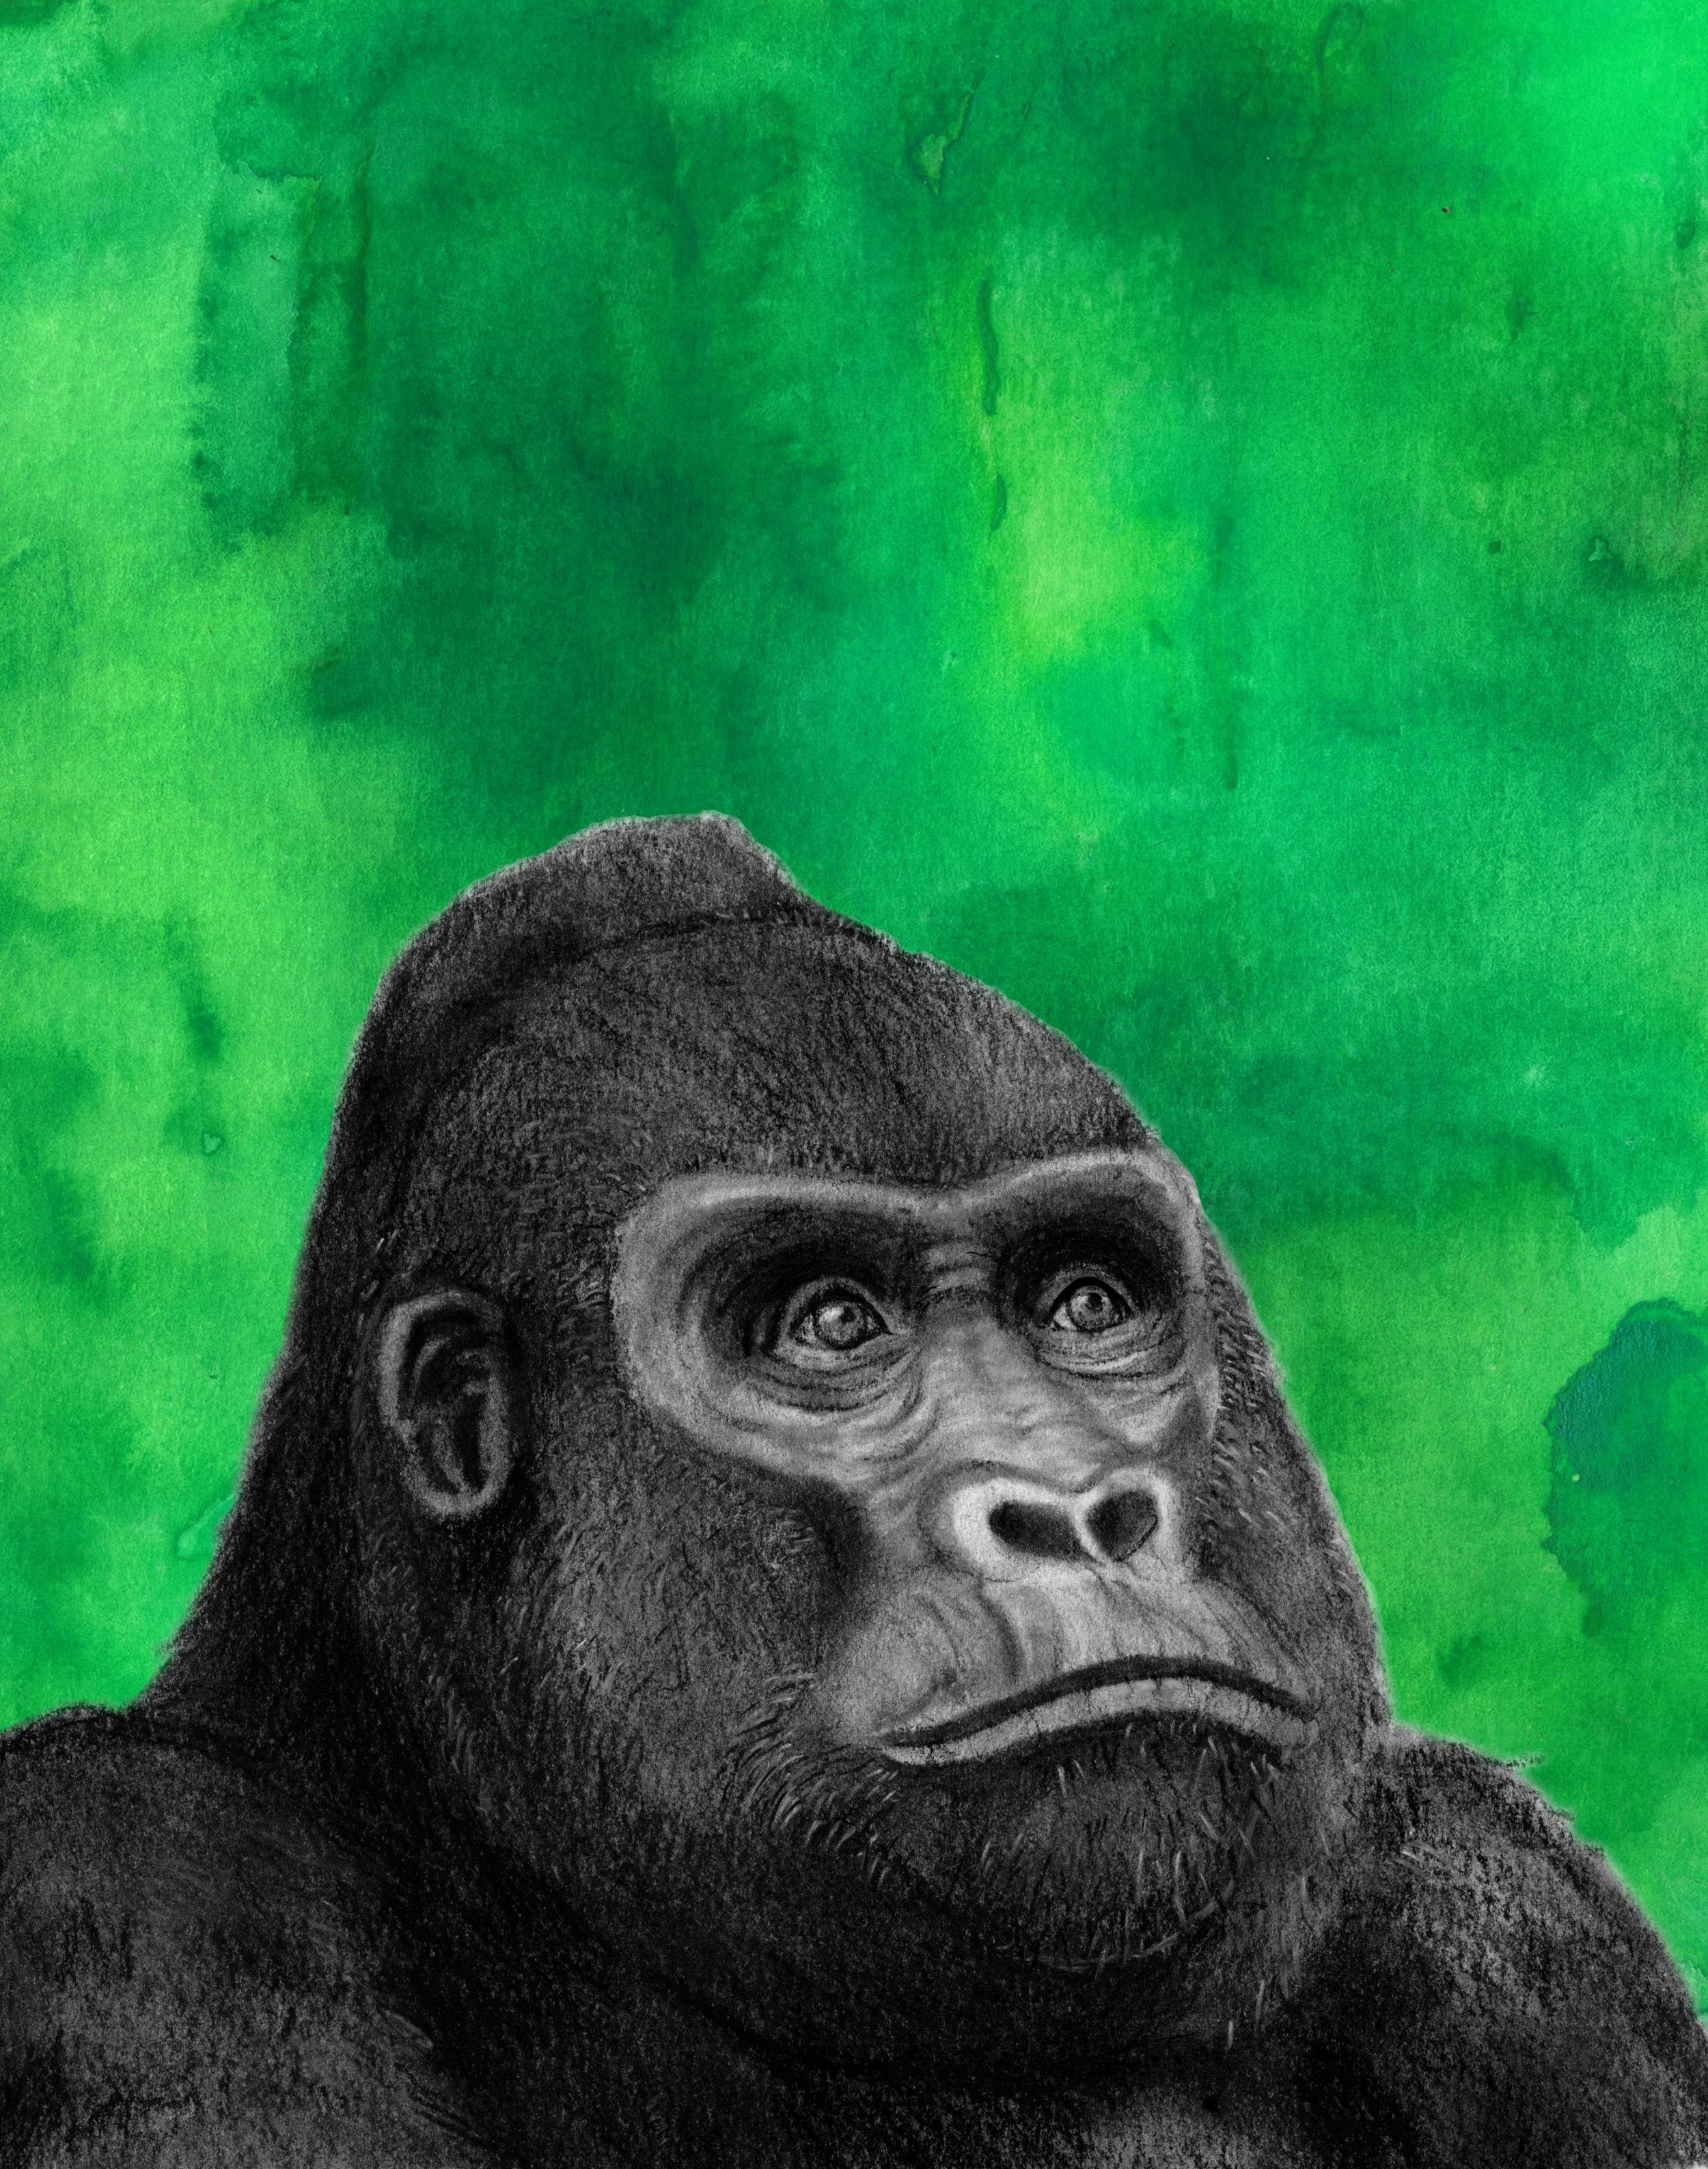 Gorilla_jungle_web.jpg